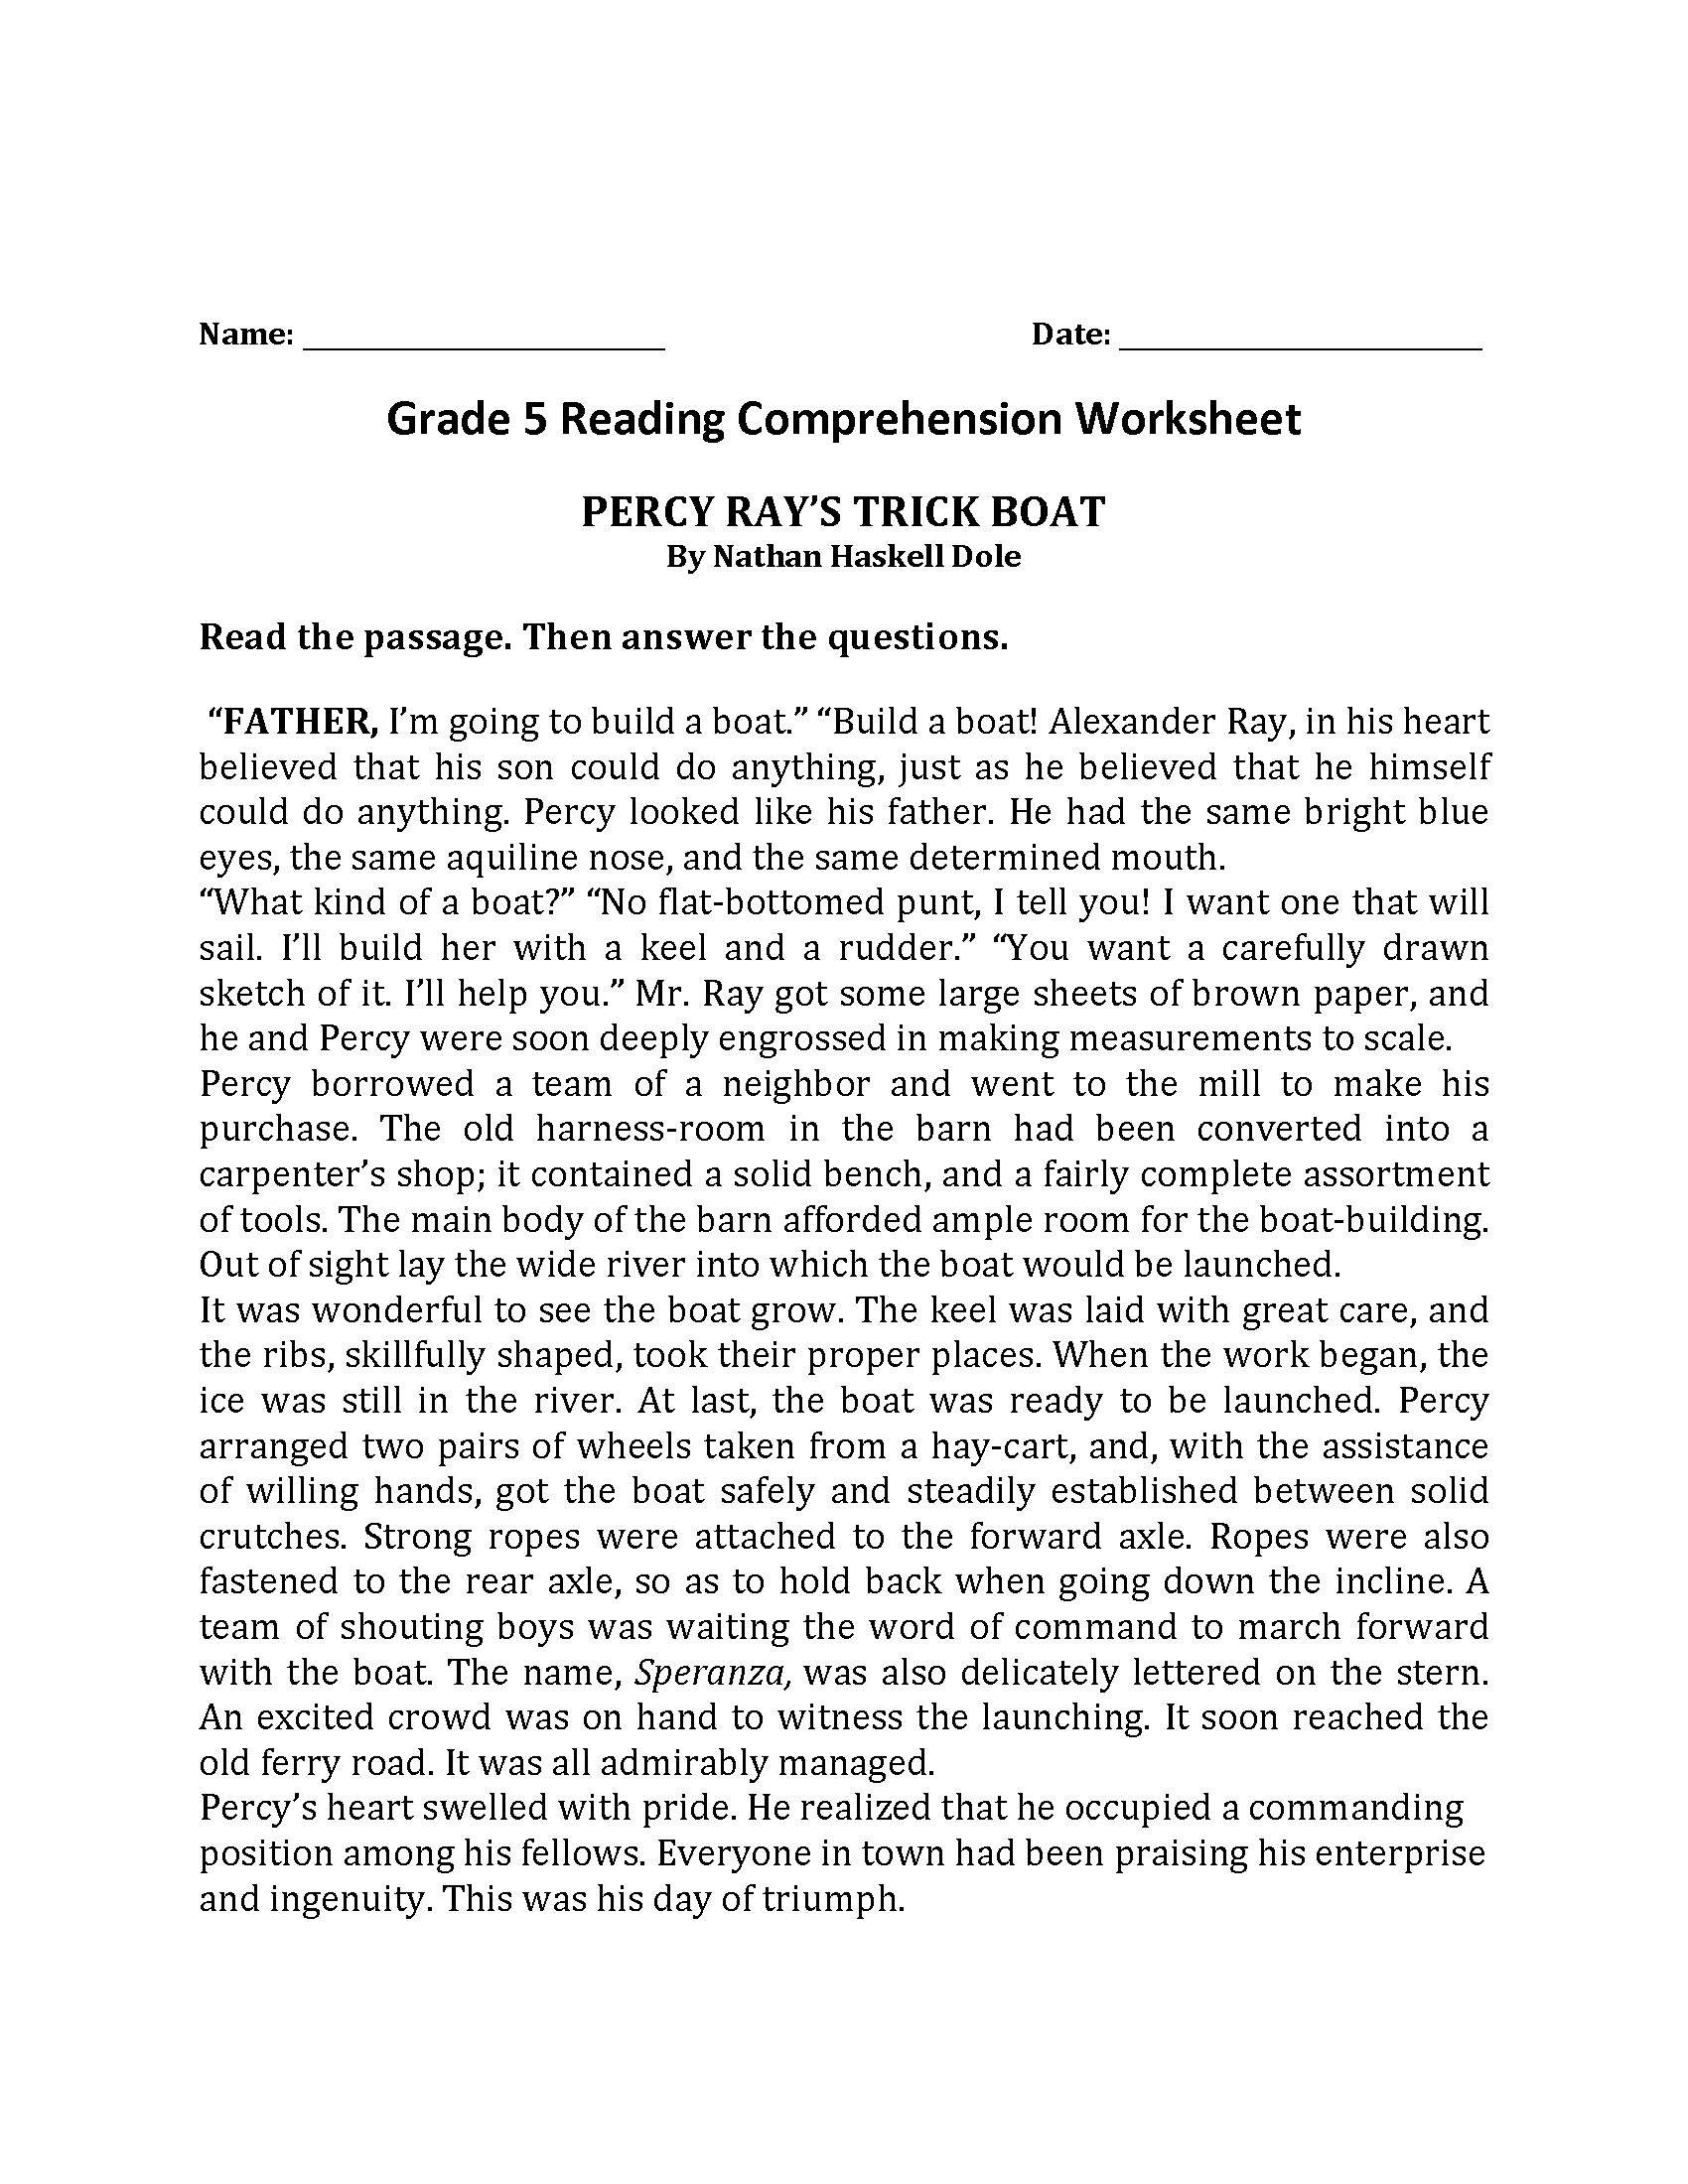 Percy Rays Trick Boat\u003cbr\u003eFifth Grade Reading Worksheets   Reading worksheets [ 2200 x 1700 Pixel ]